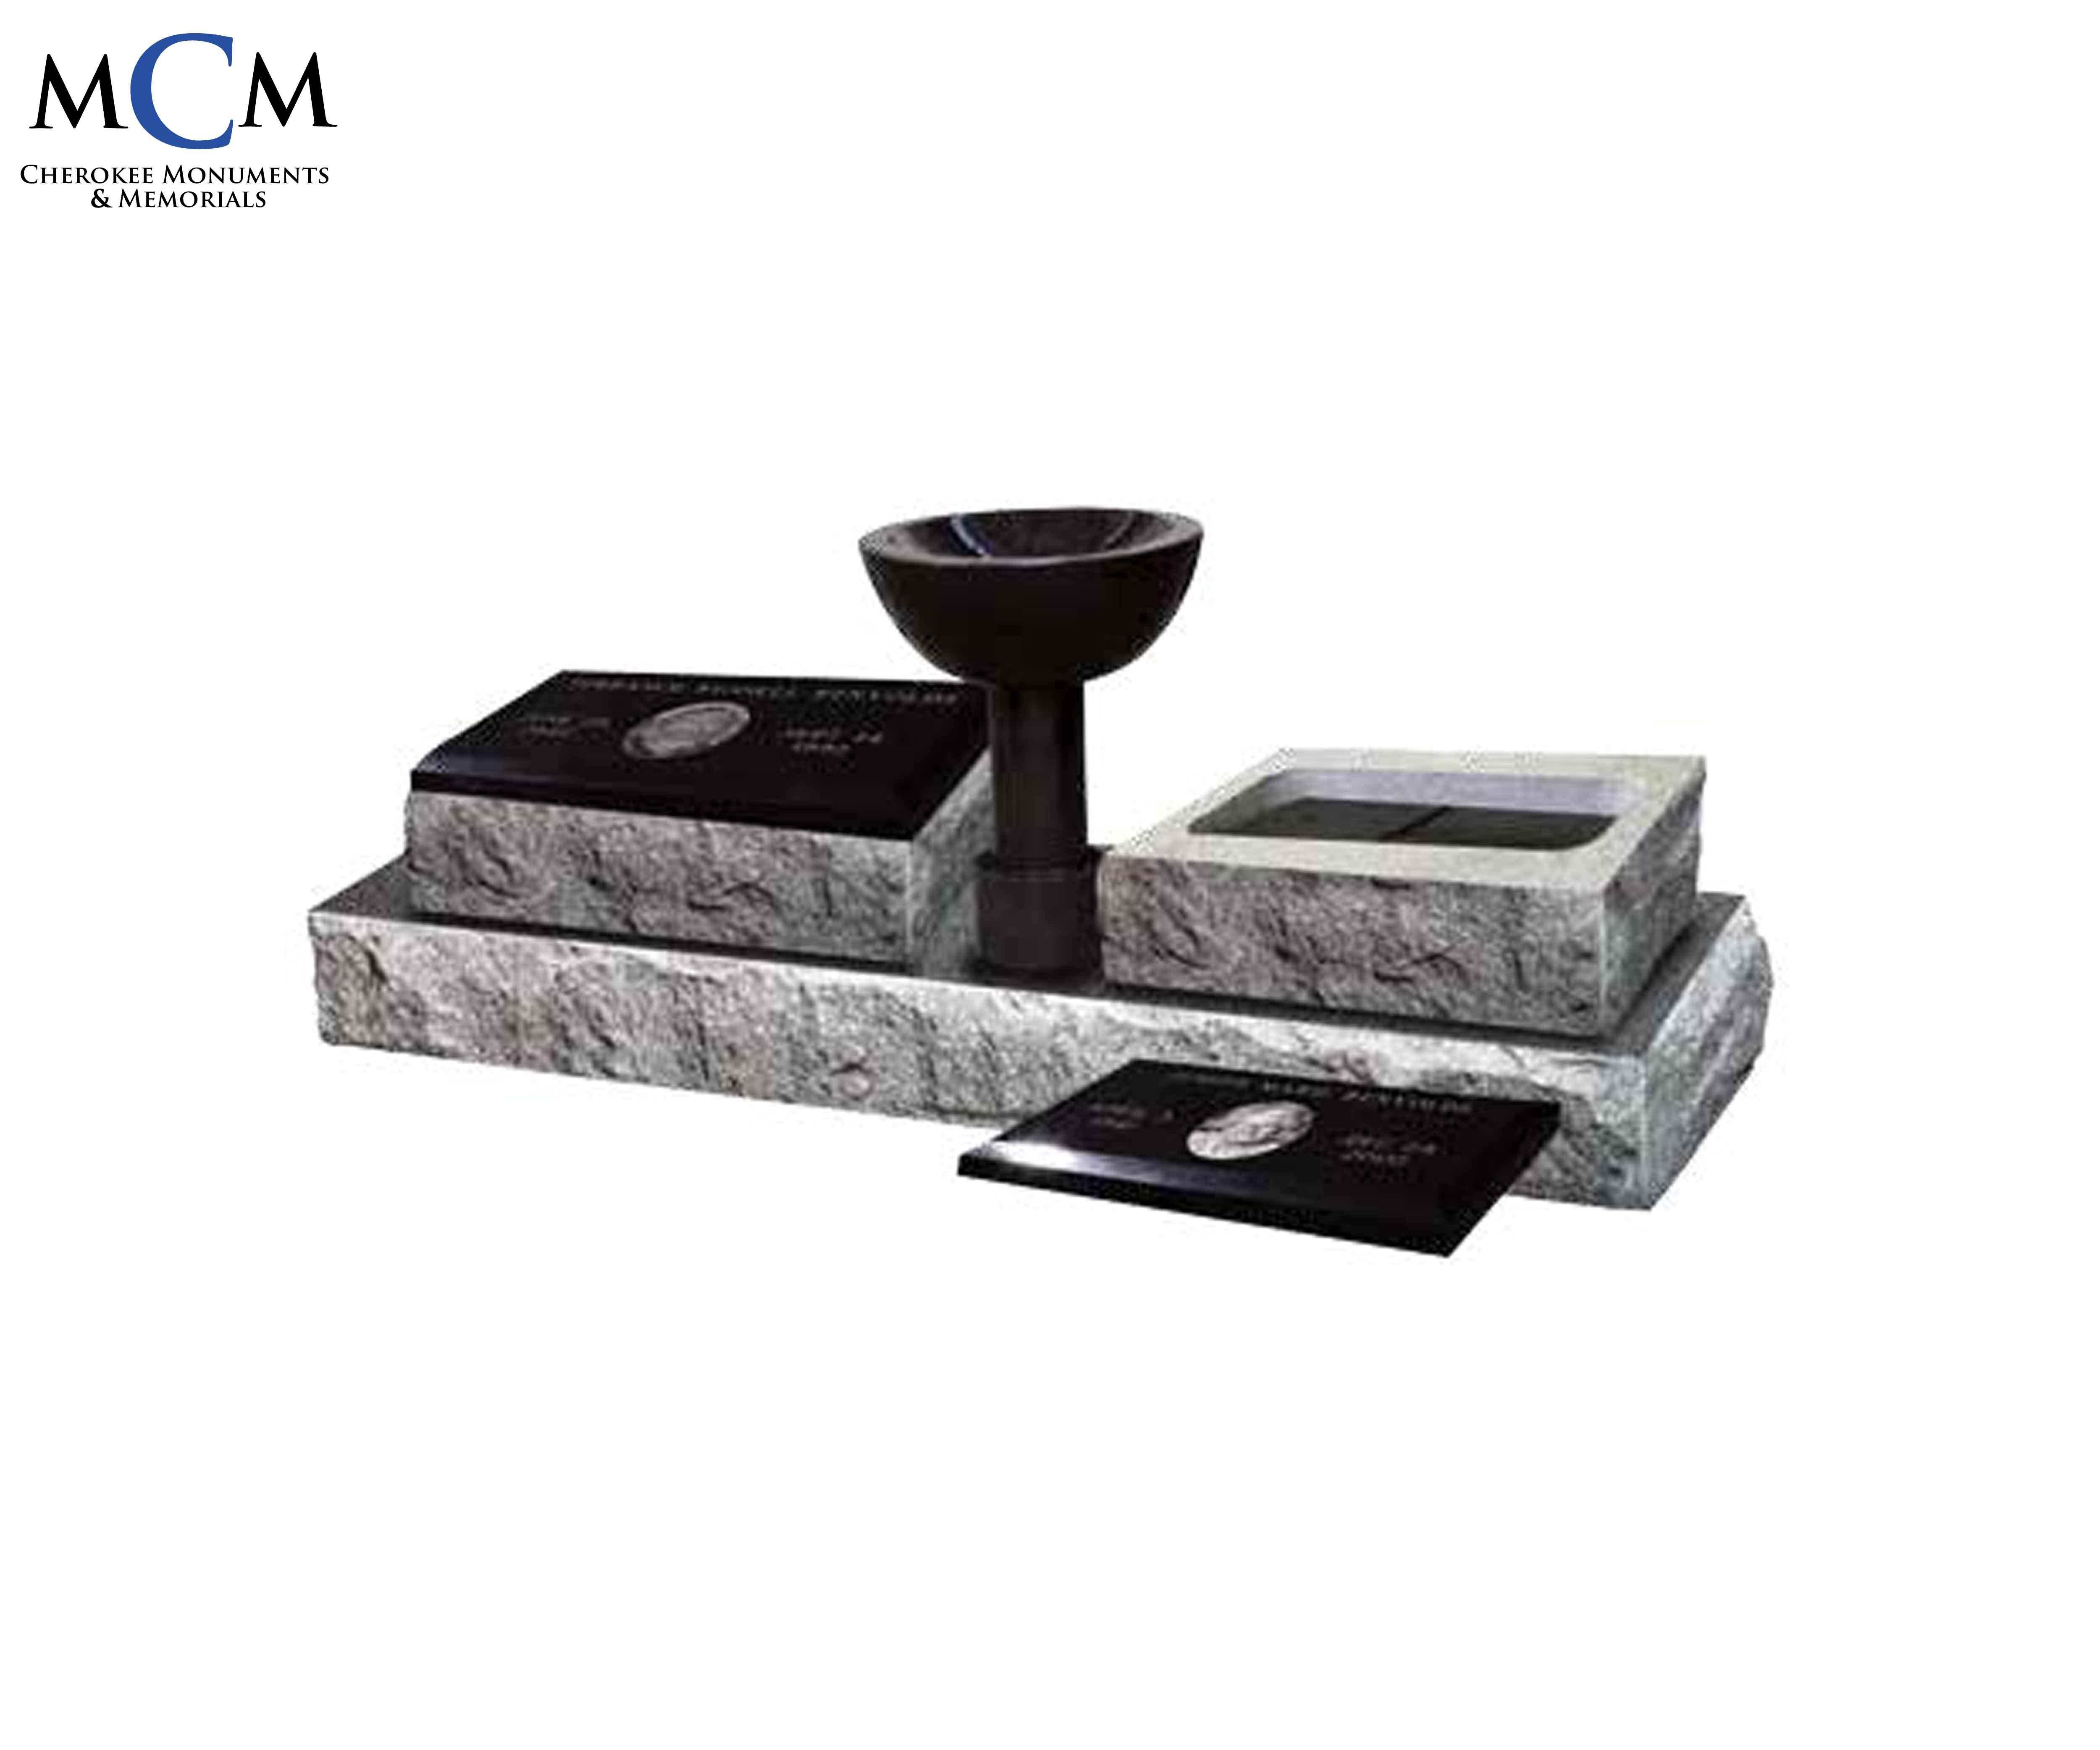 Granite Bevel Markers - Cherokee Monuments & Memorials